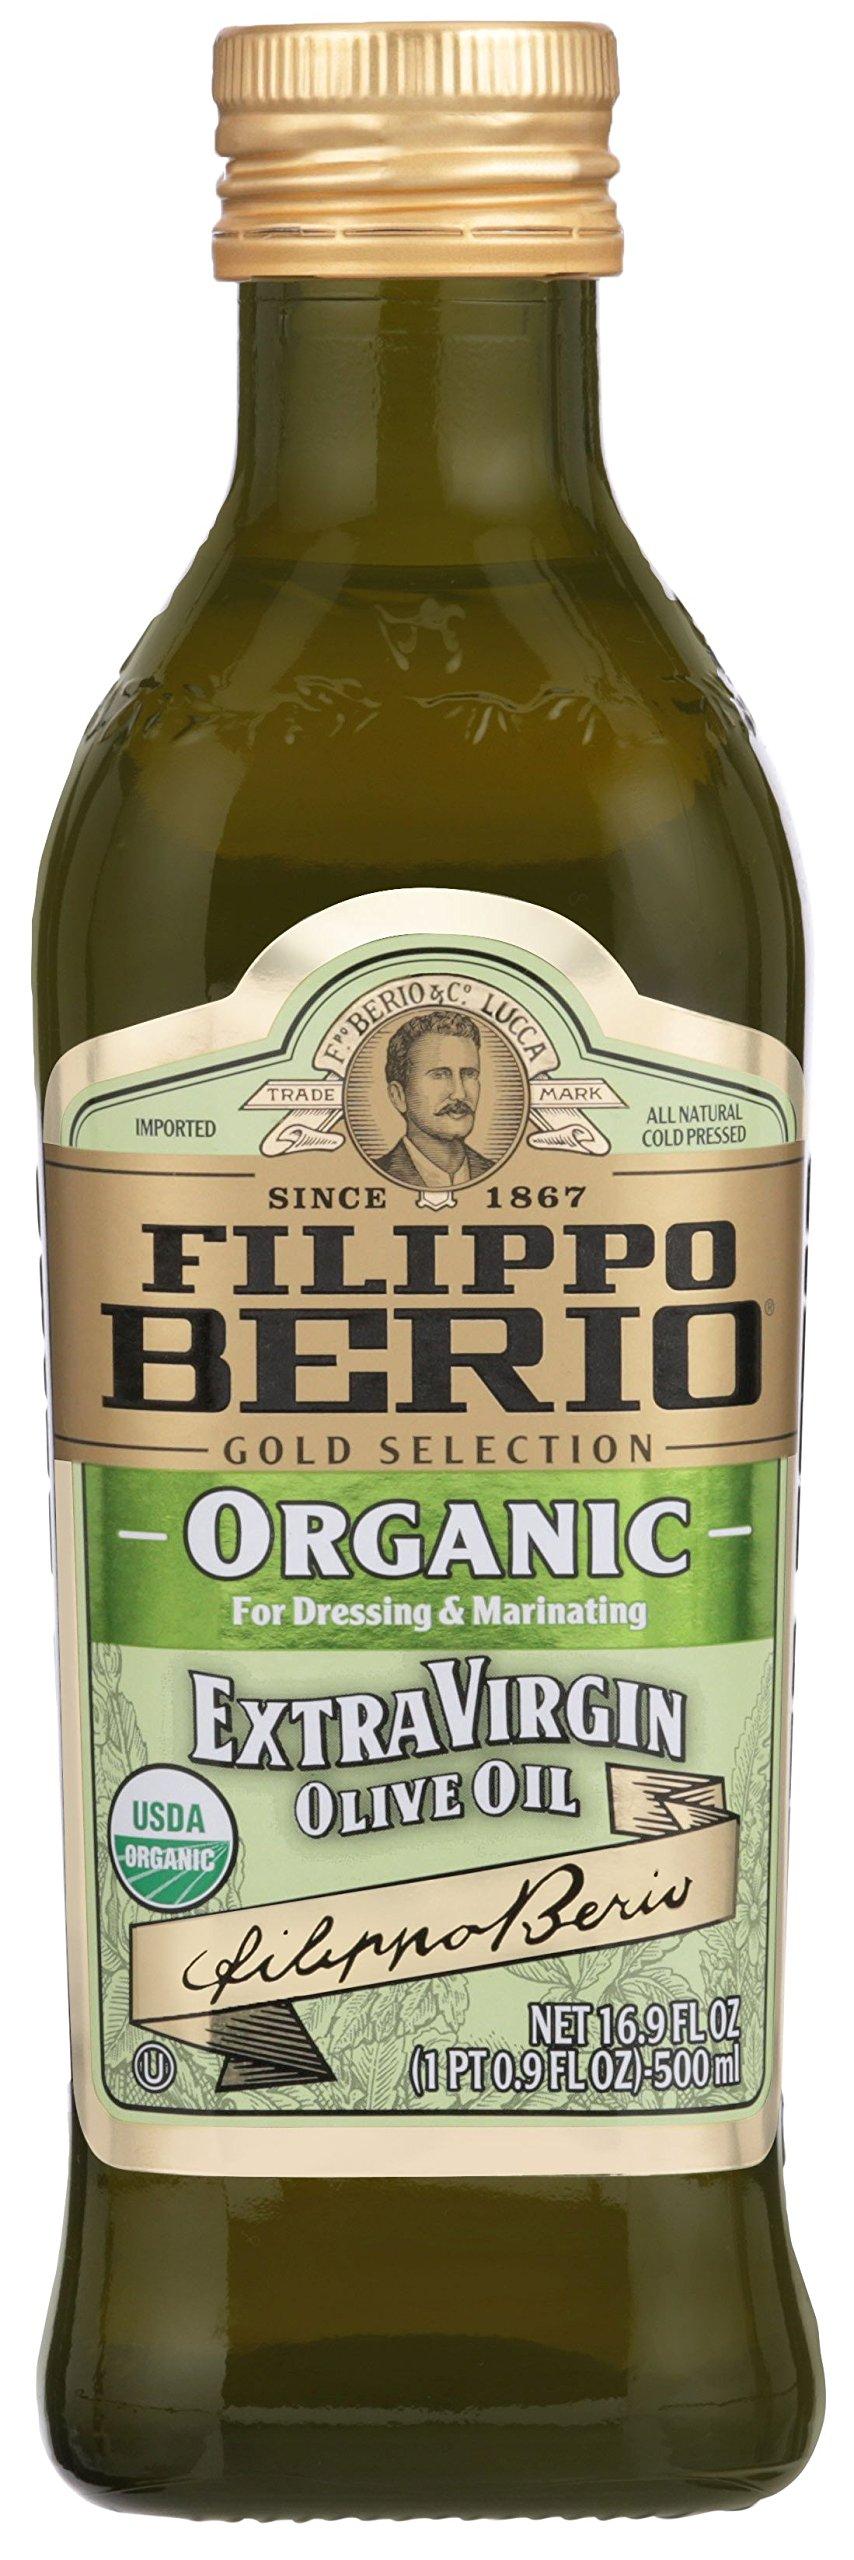 Filippo Berio Organic Extra Virgin Olive Oil, 16.9 Ounce